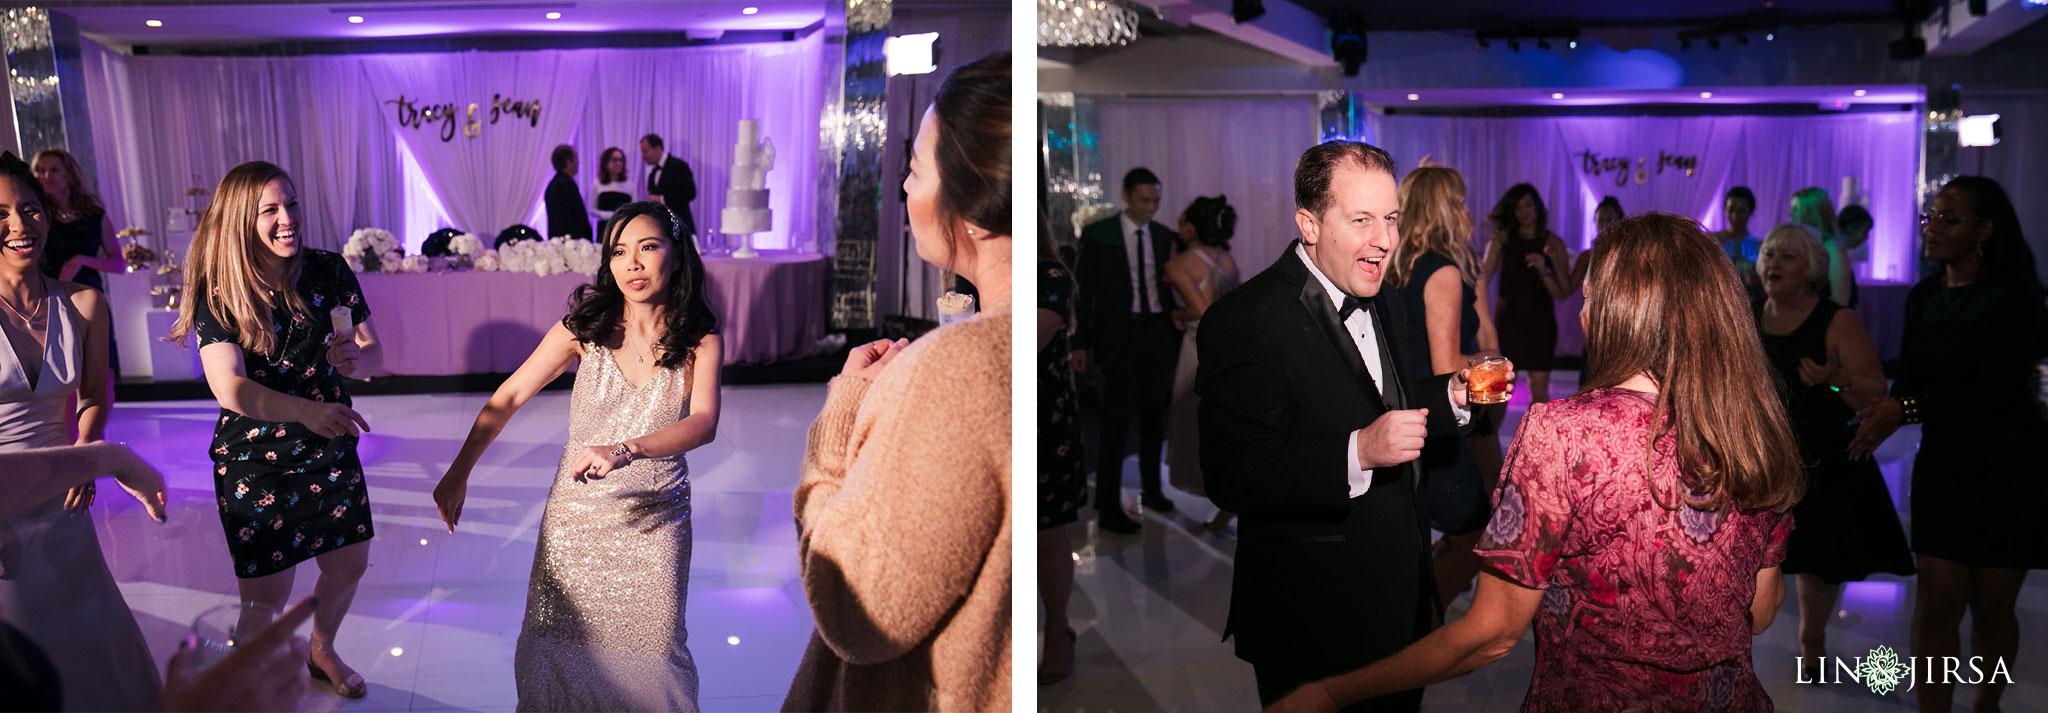 39 vertigo banquet hall glendale wedding photography